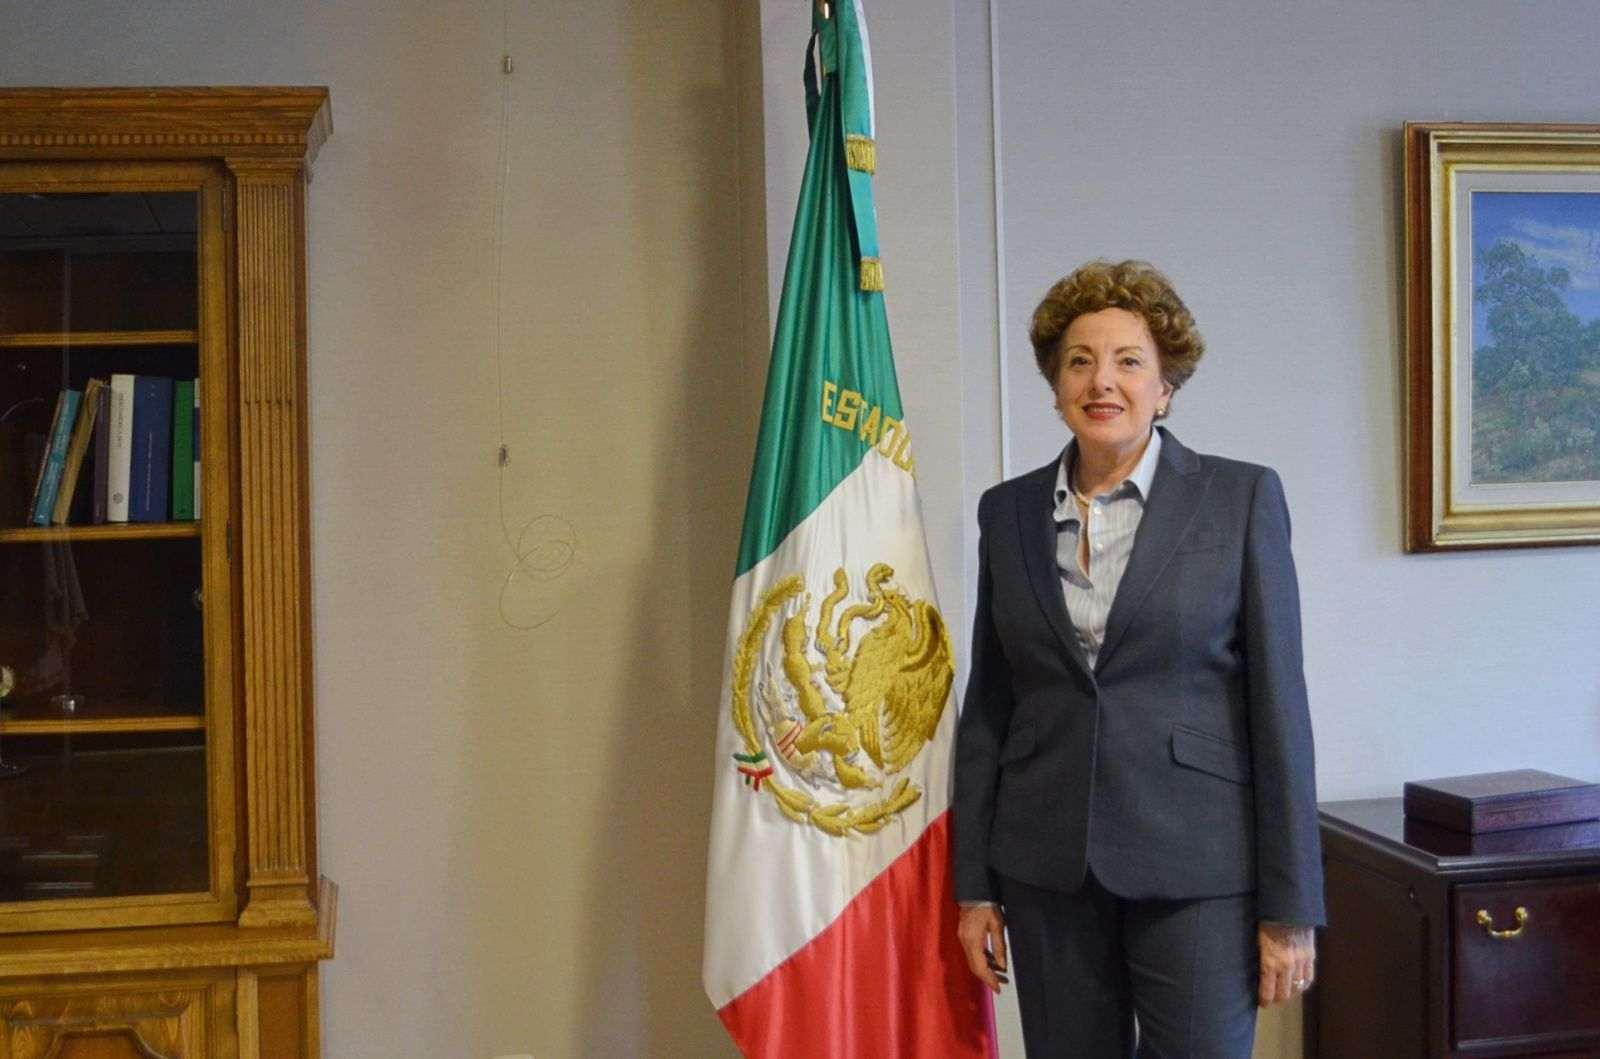 Roberta Lajous Vargas - Carlos Miguélez Monroy